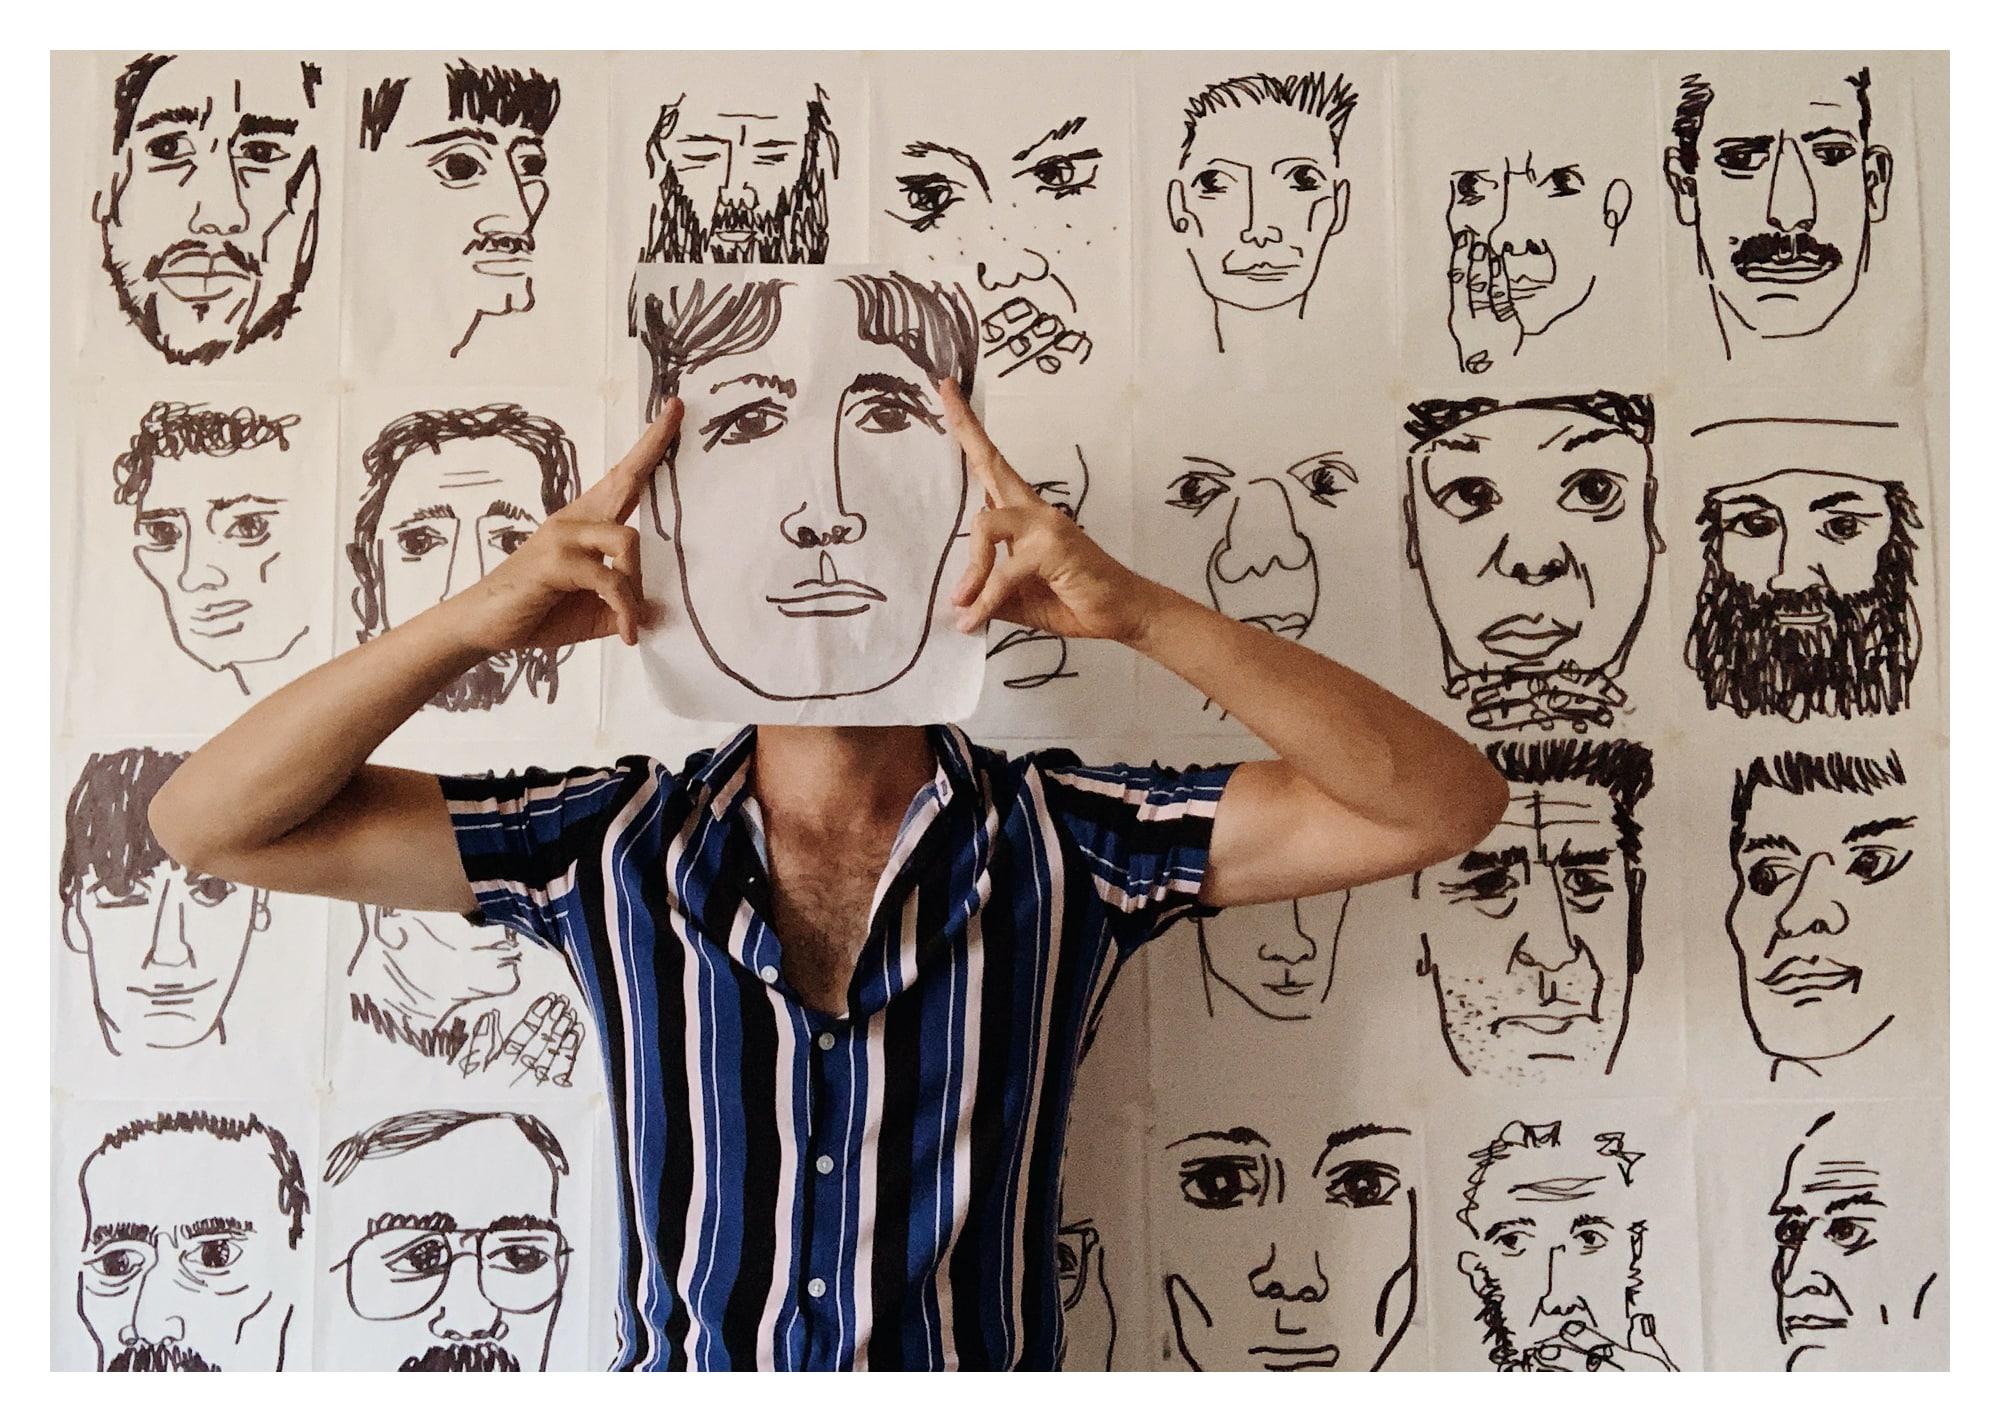 Art piece by Francisco Costa